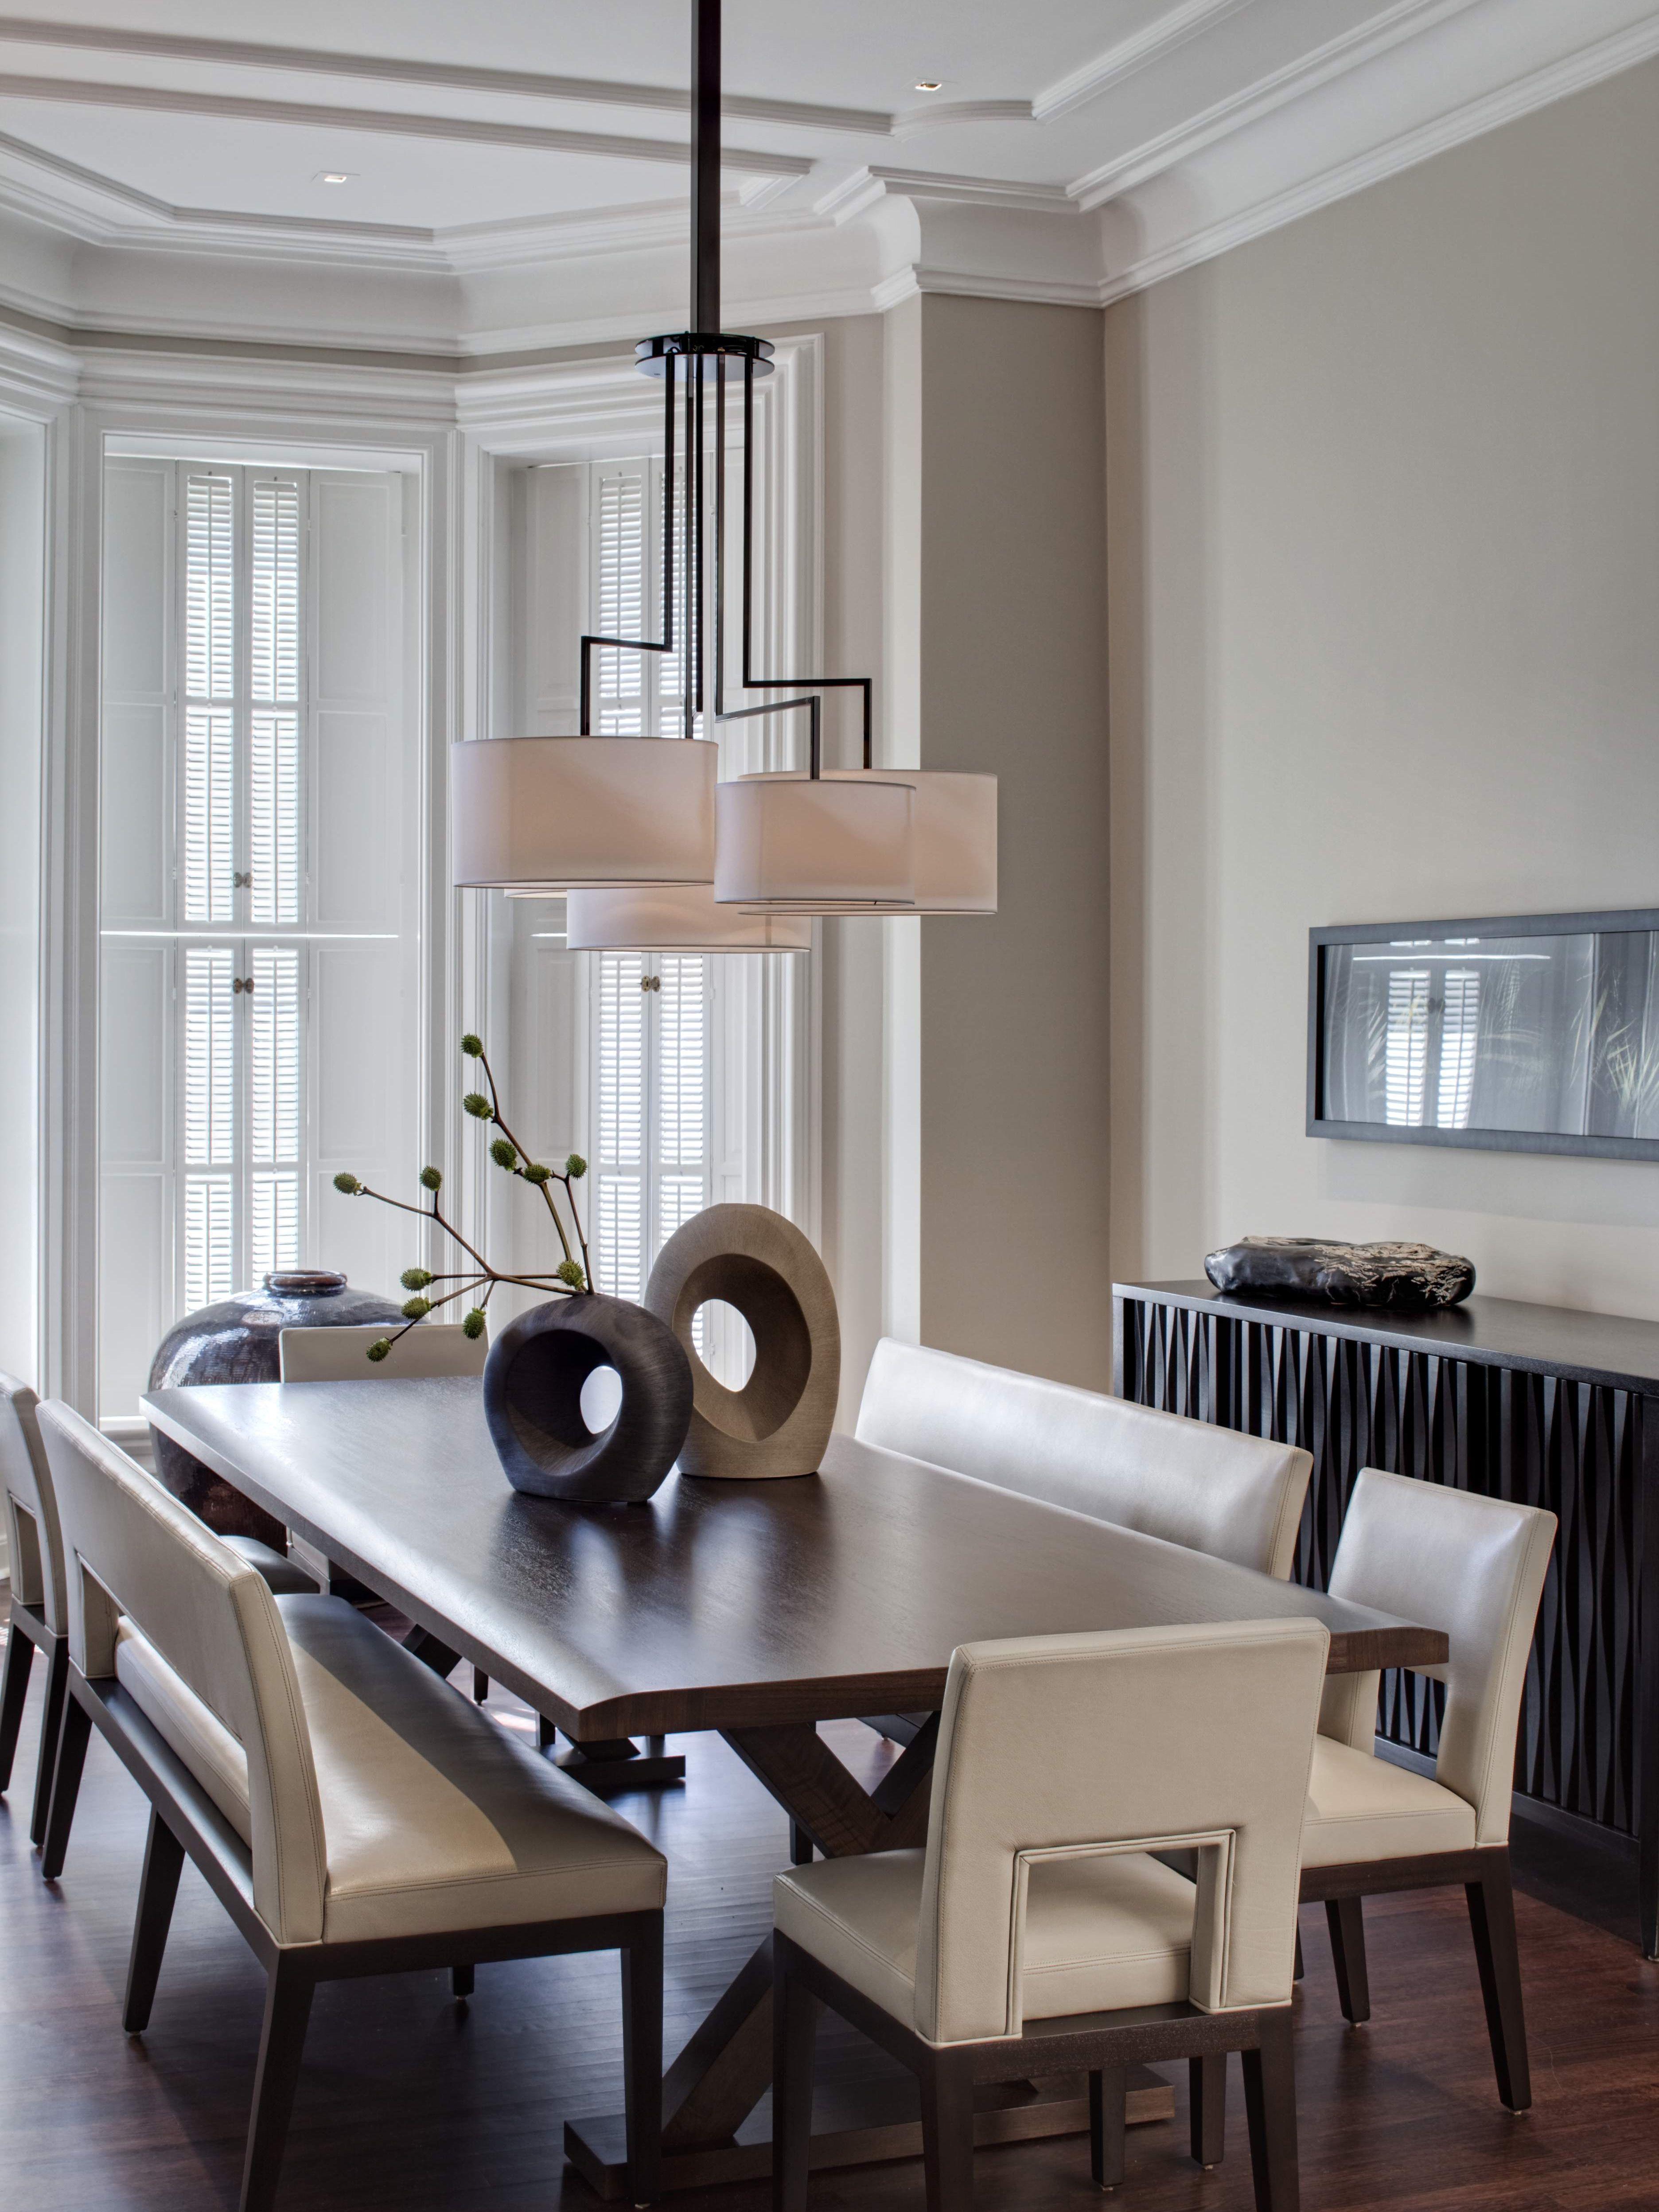 30 Modern Dining Room Interior Design And Ideas Minimalist